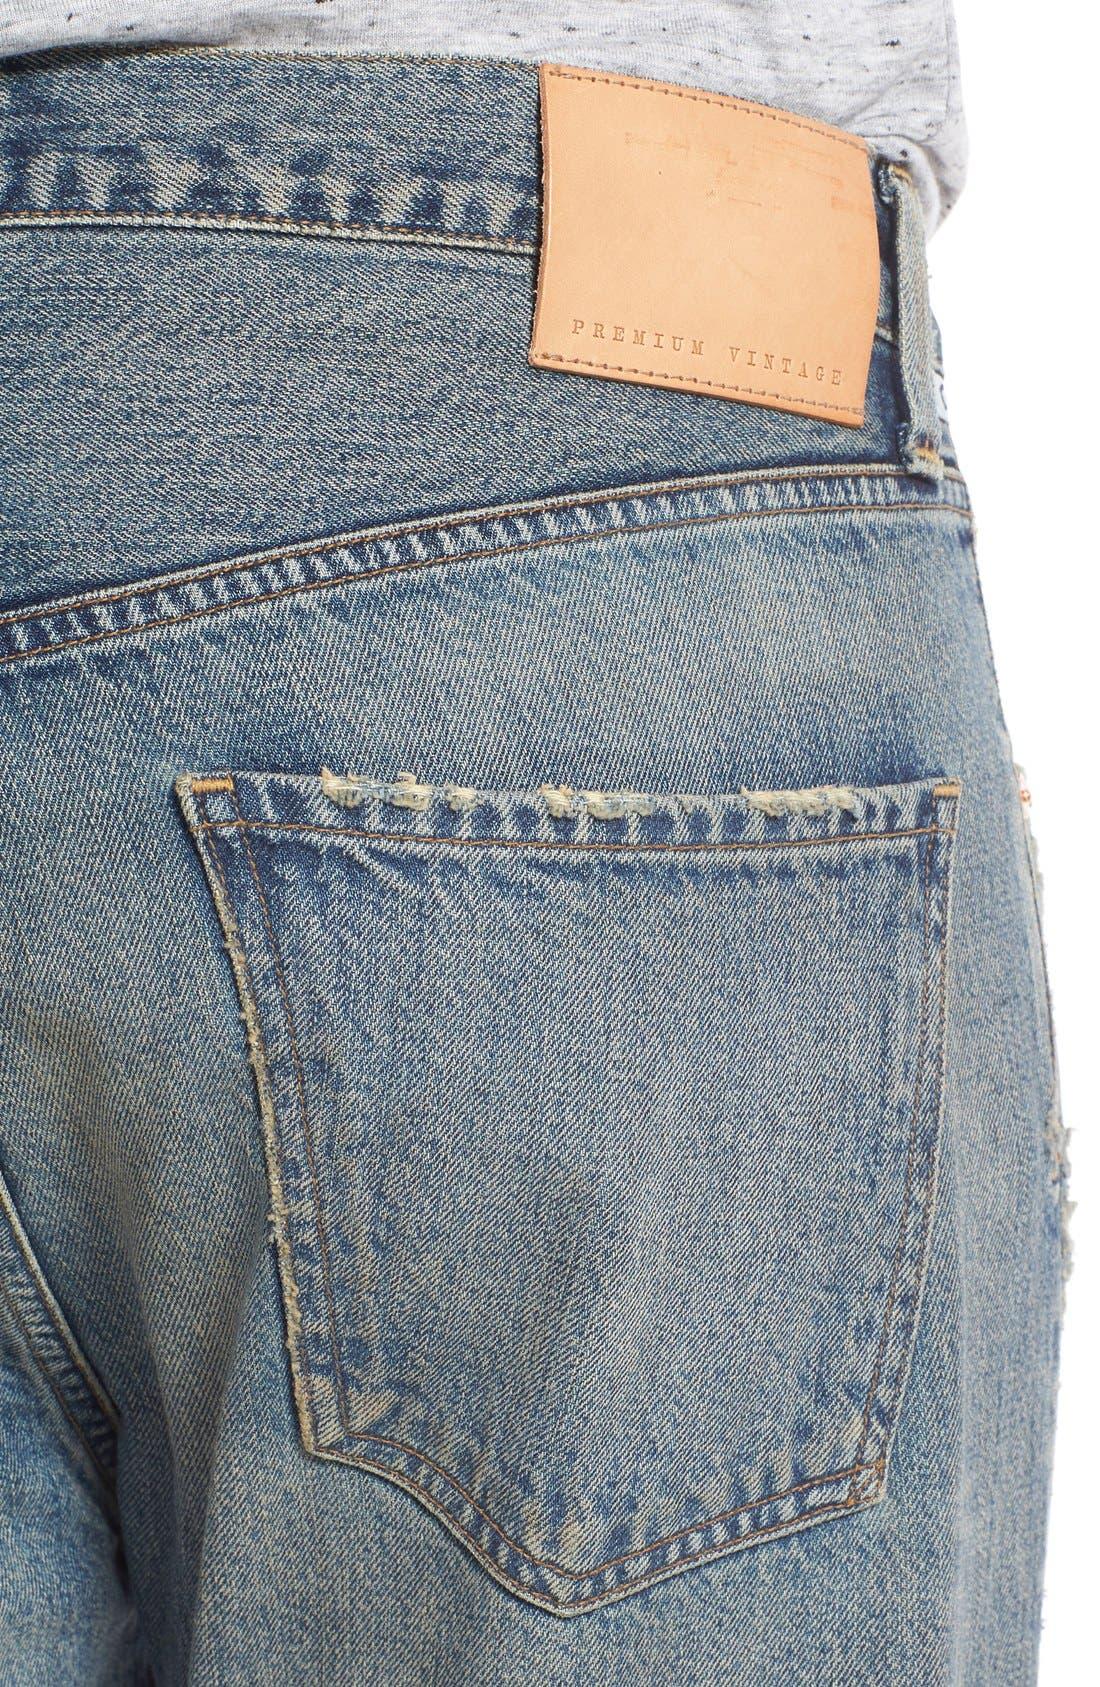 Rowan Slouchy Skinny Fit Jeans,                             Alternate thumbnail 4, color,                             462